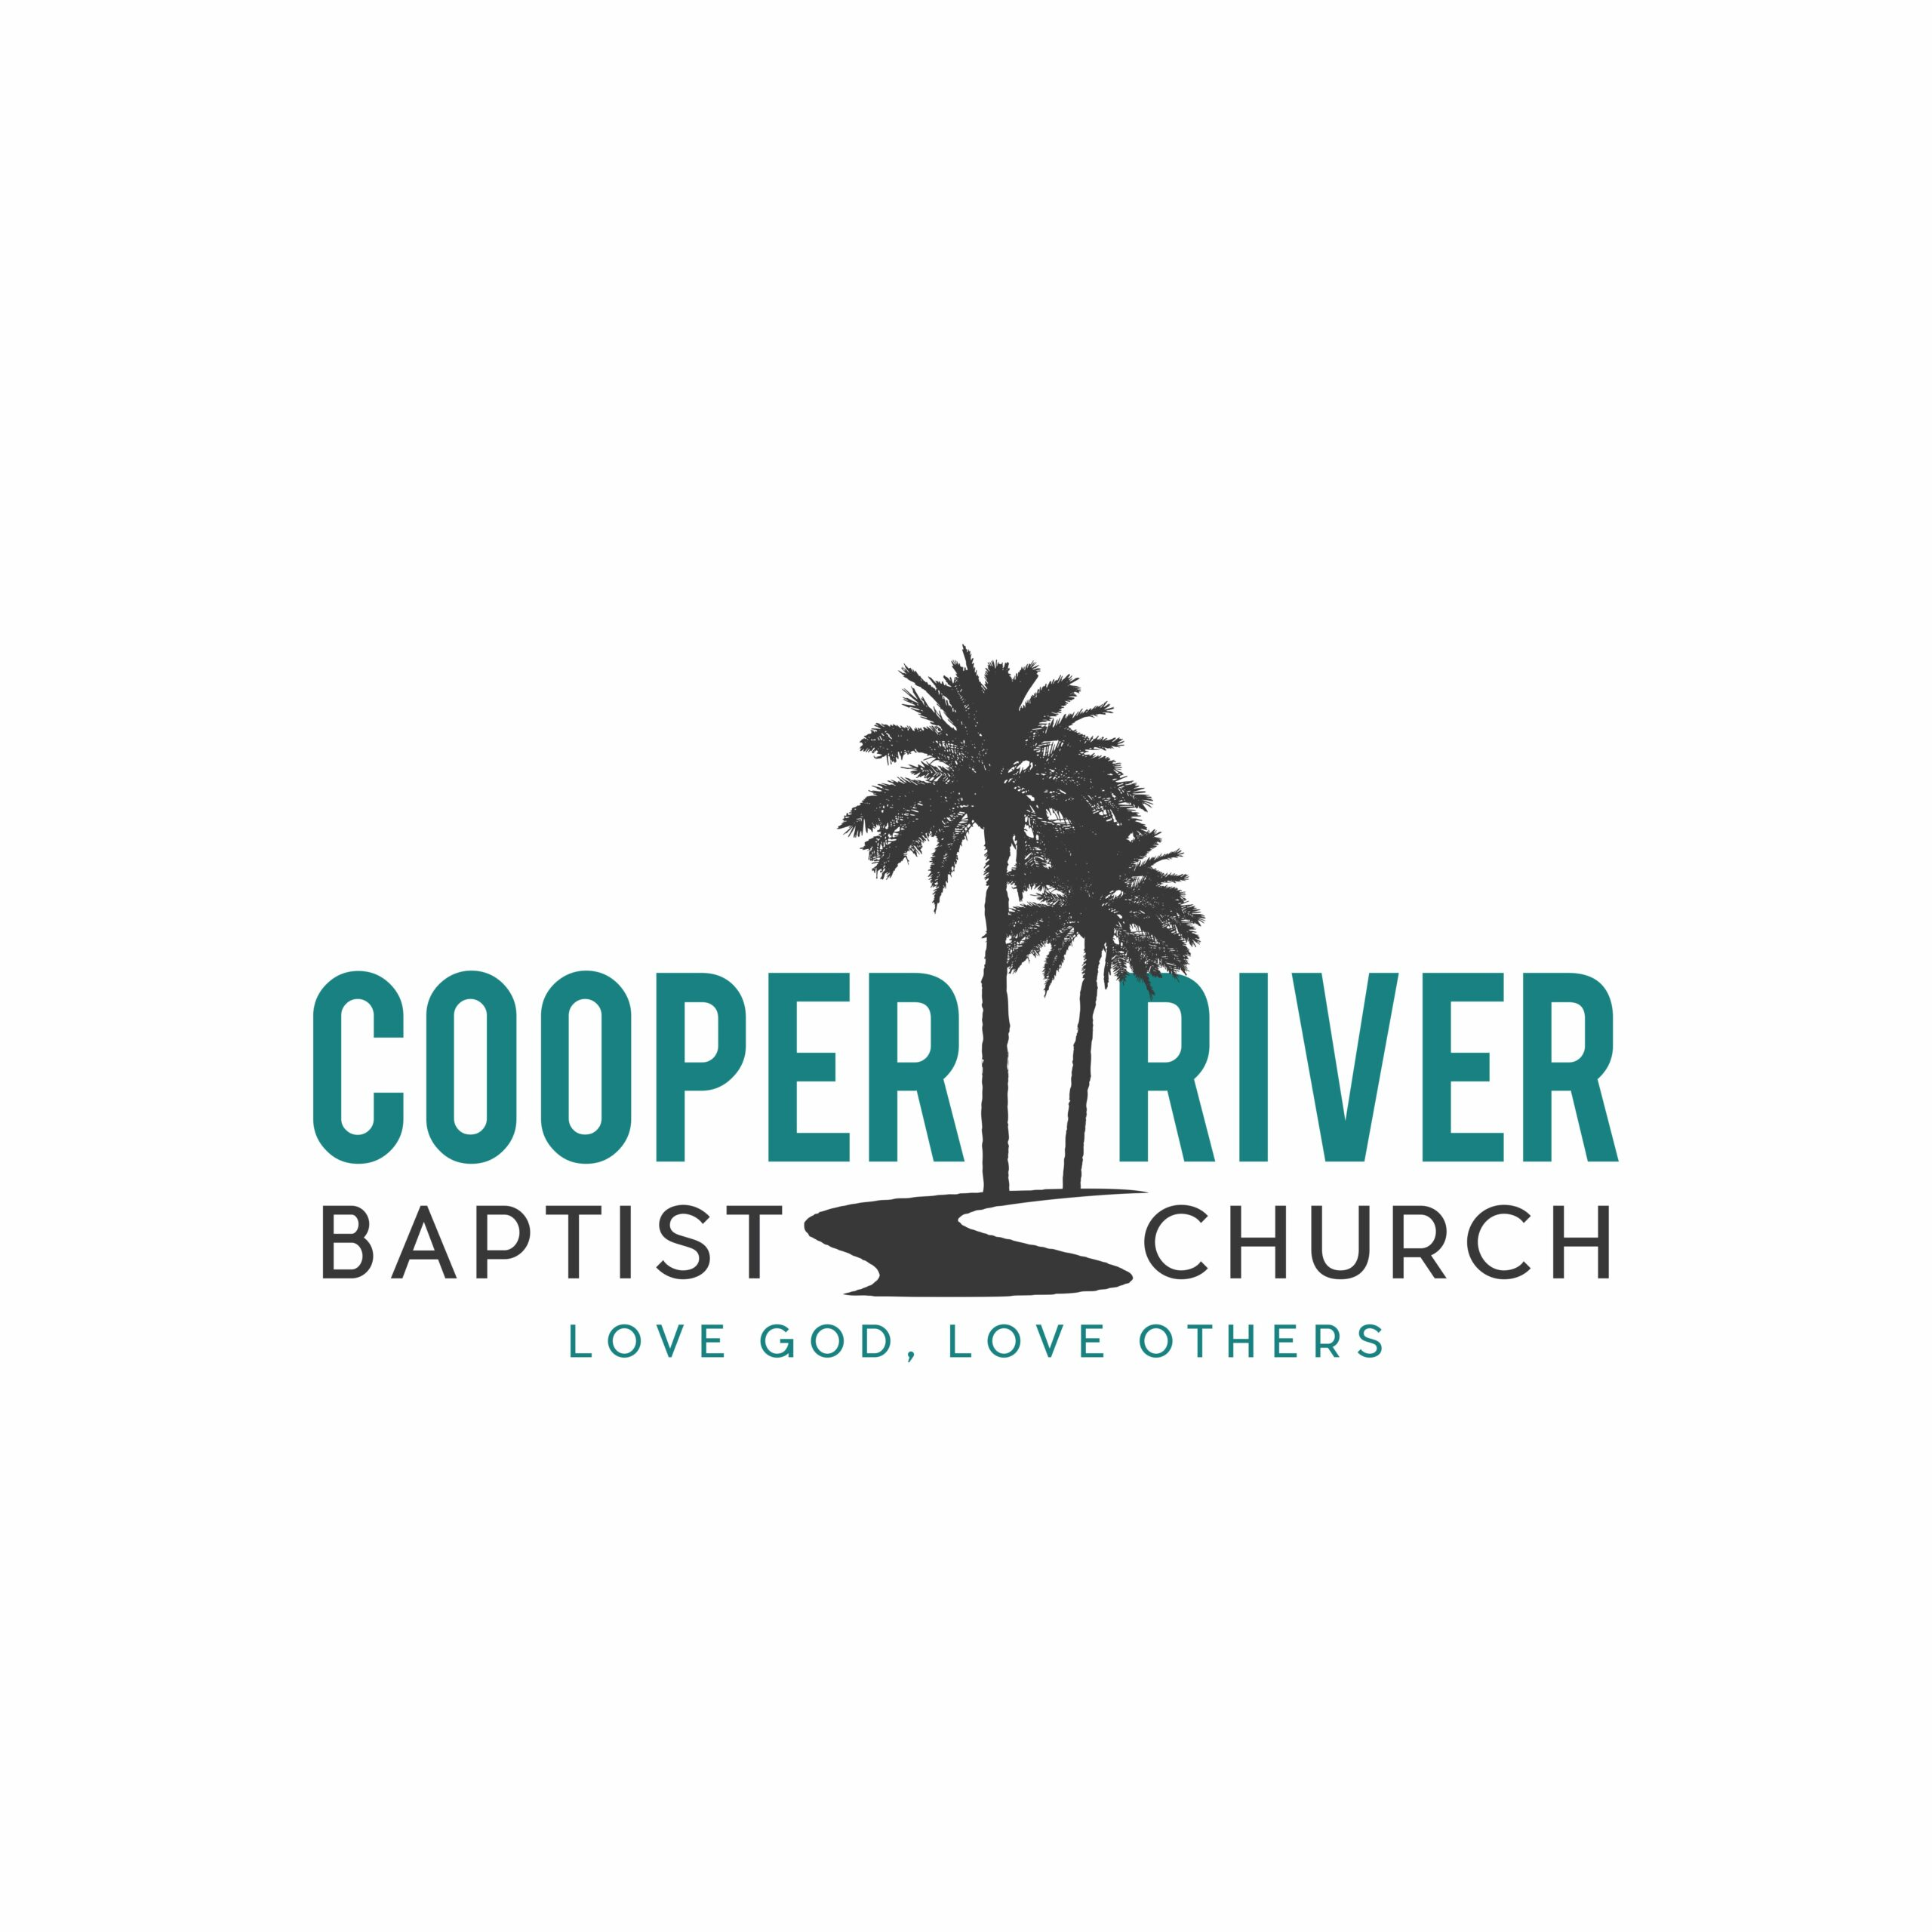 Cooper River Baptist Church